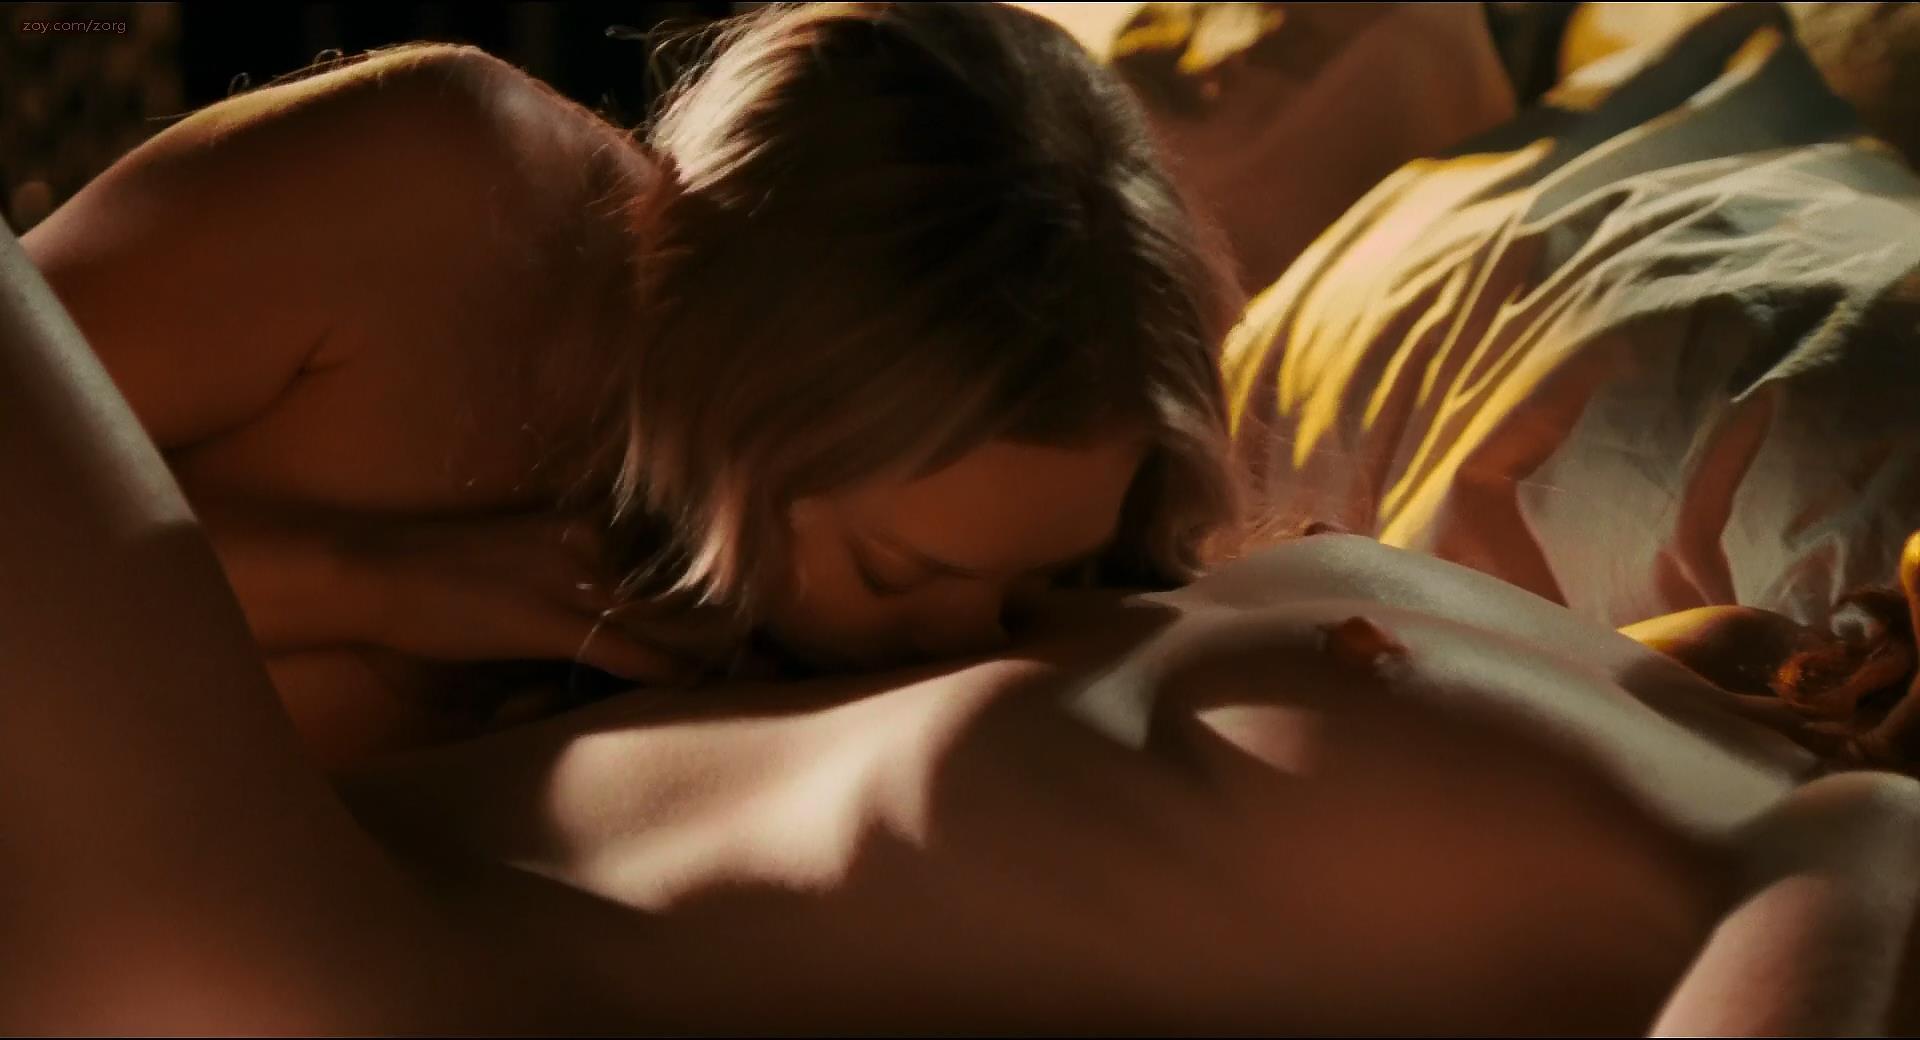 Hottest sex scenes ever — photo 8